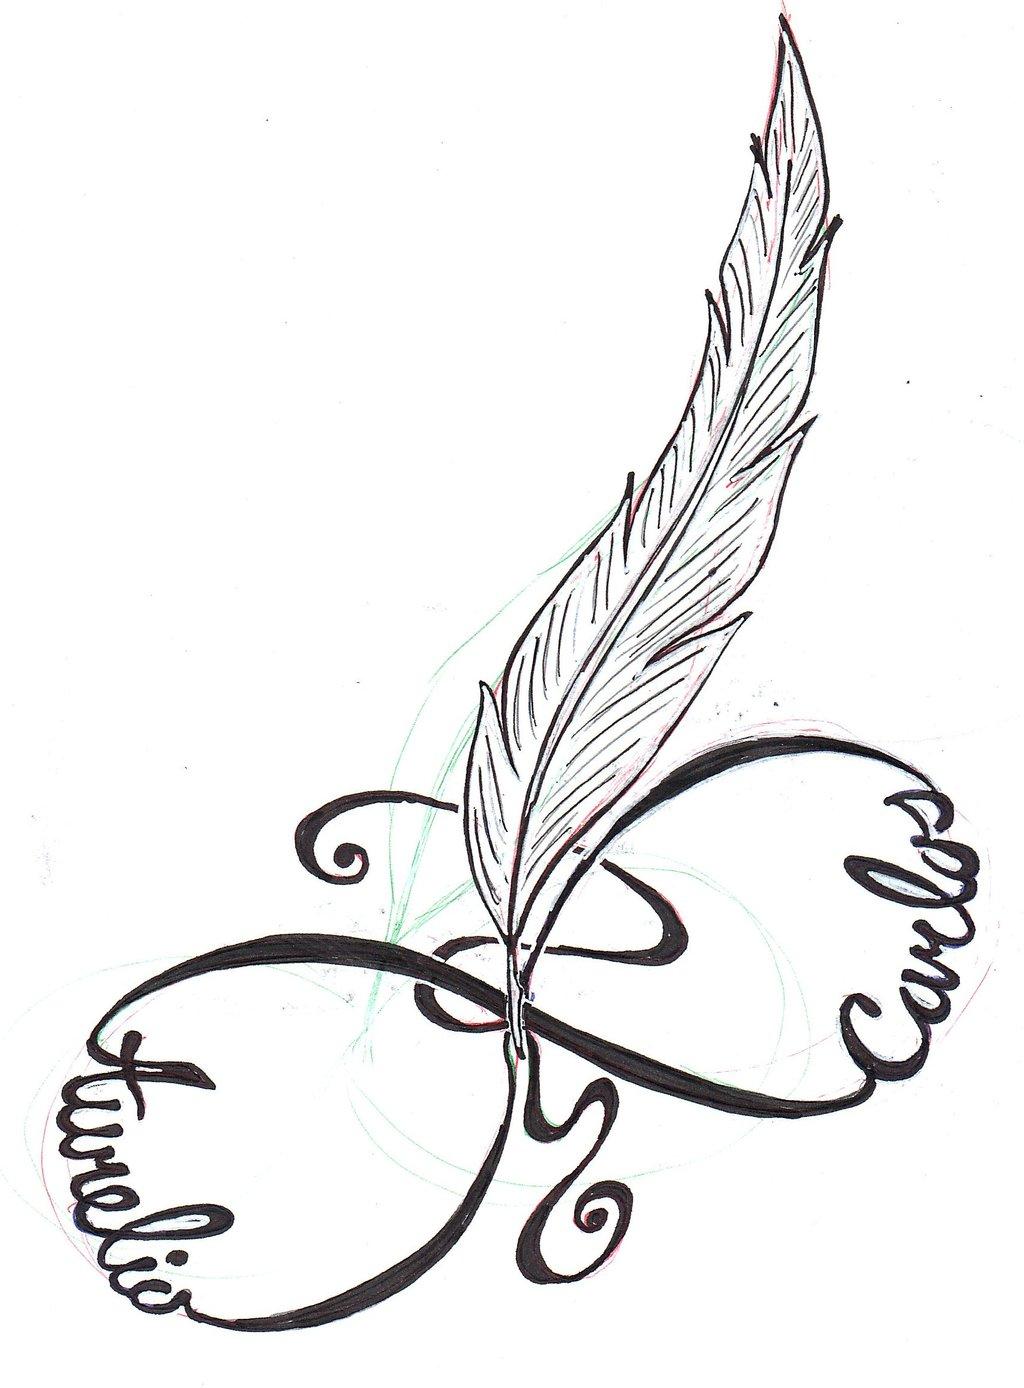 Love yourself infinity tattoo on hip feather infinity tattoo design by slk grafix buycottarizona